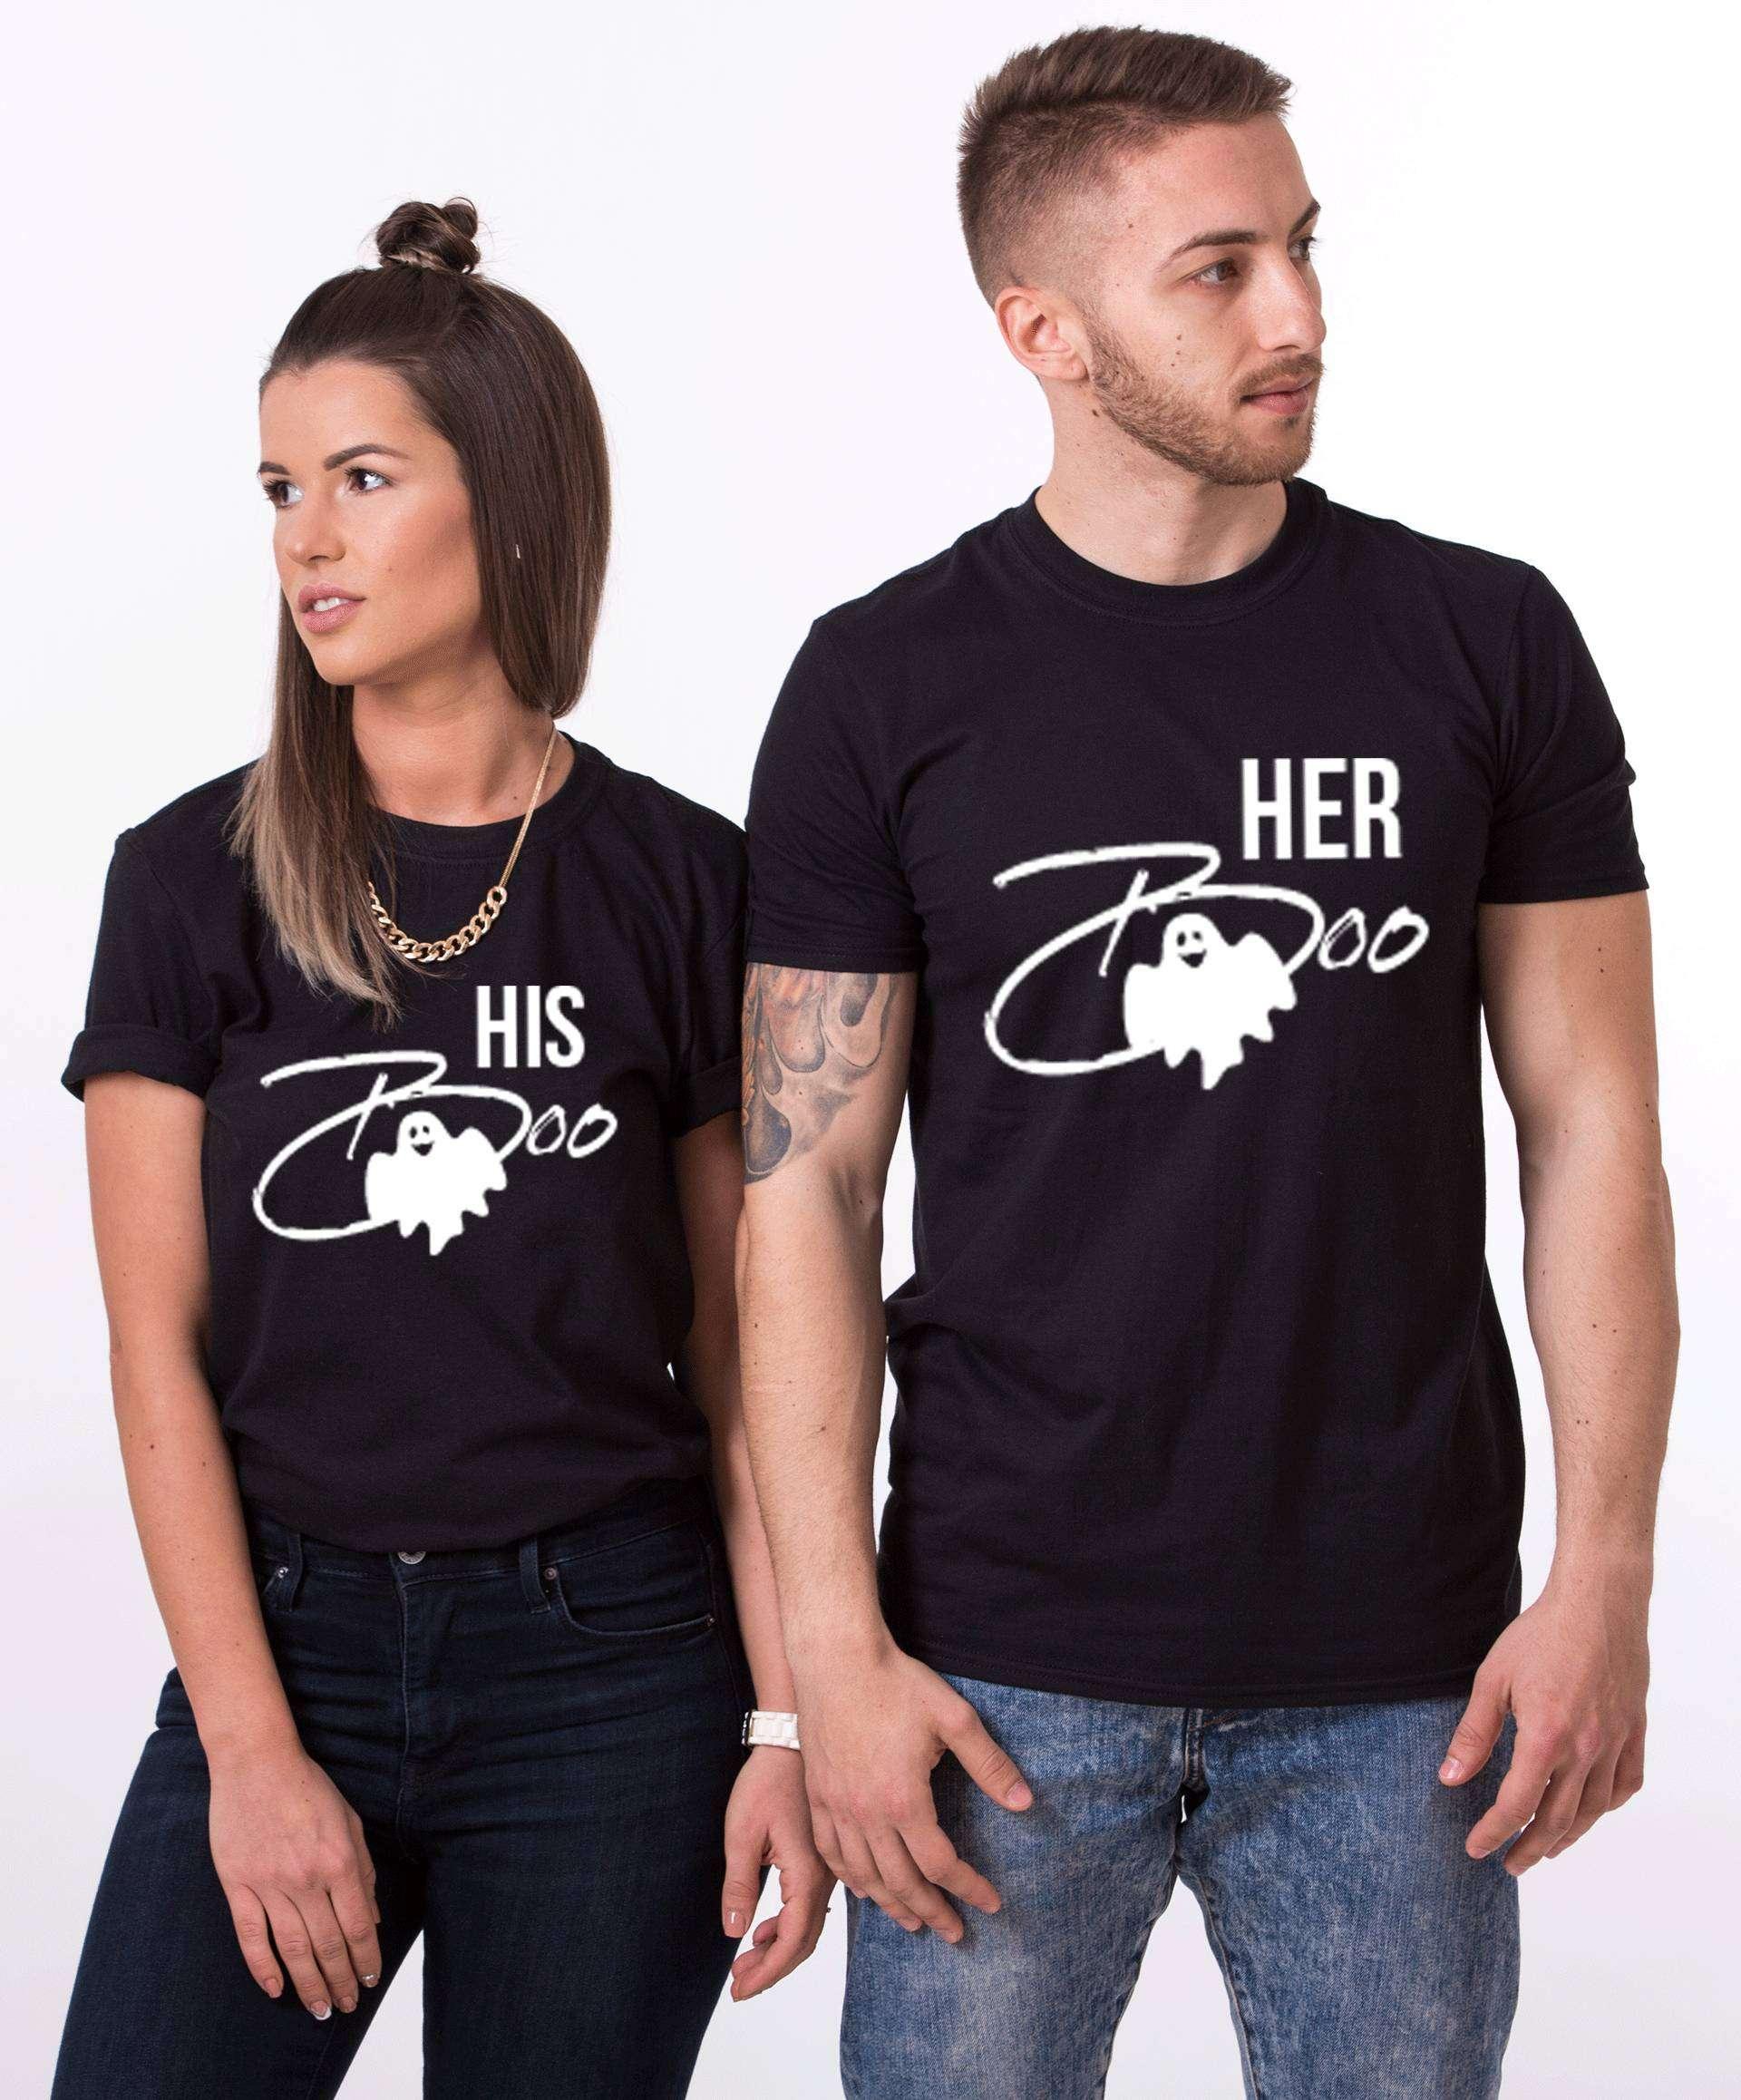 180c7eee Her Boo His Boo, Matching Couples Shirts, Halloween Shirts